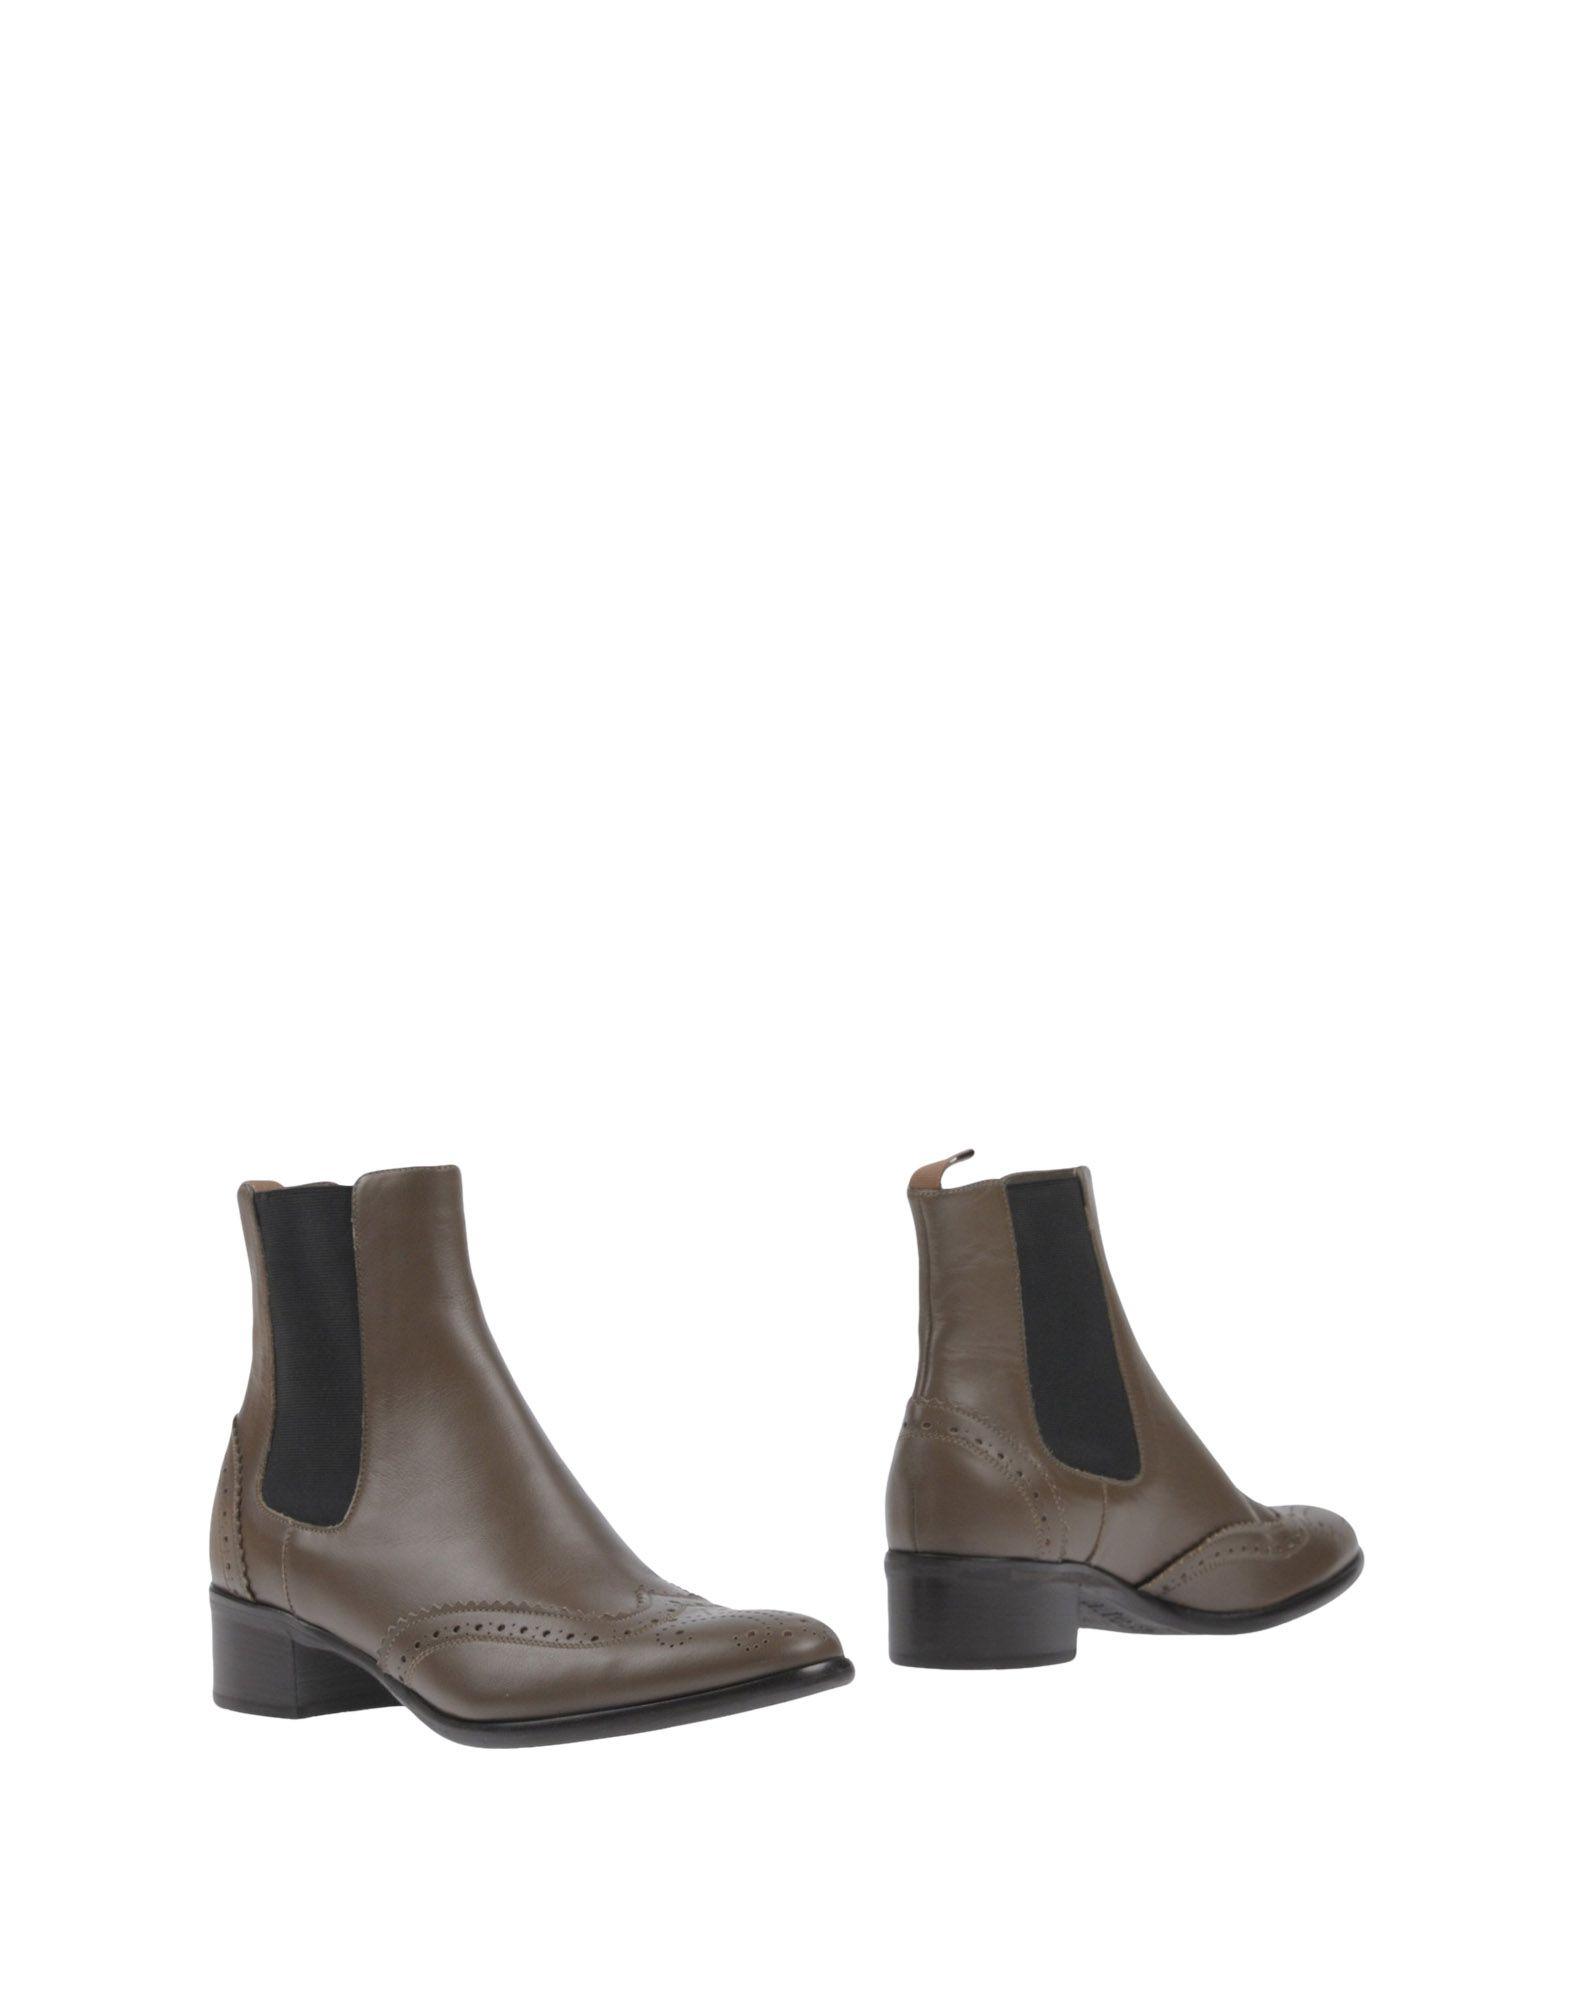 A.Testoni Chelsea Boots Damen  11453488KL Beliebte Beliebte Beliebte Schuhe 9e03bf